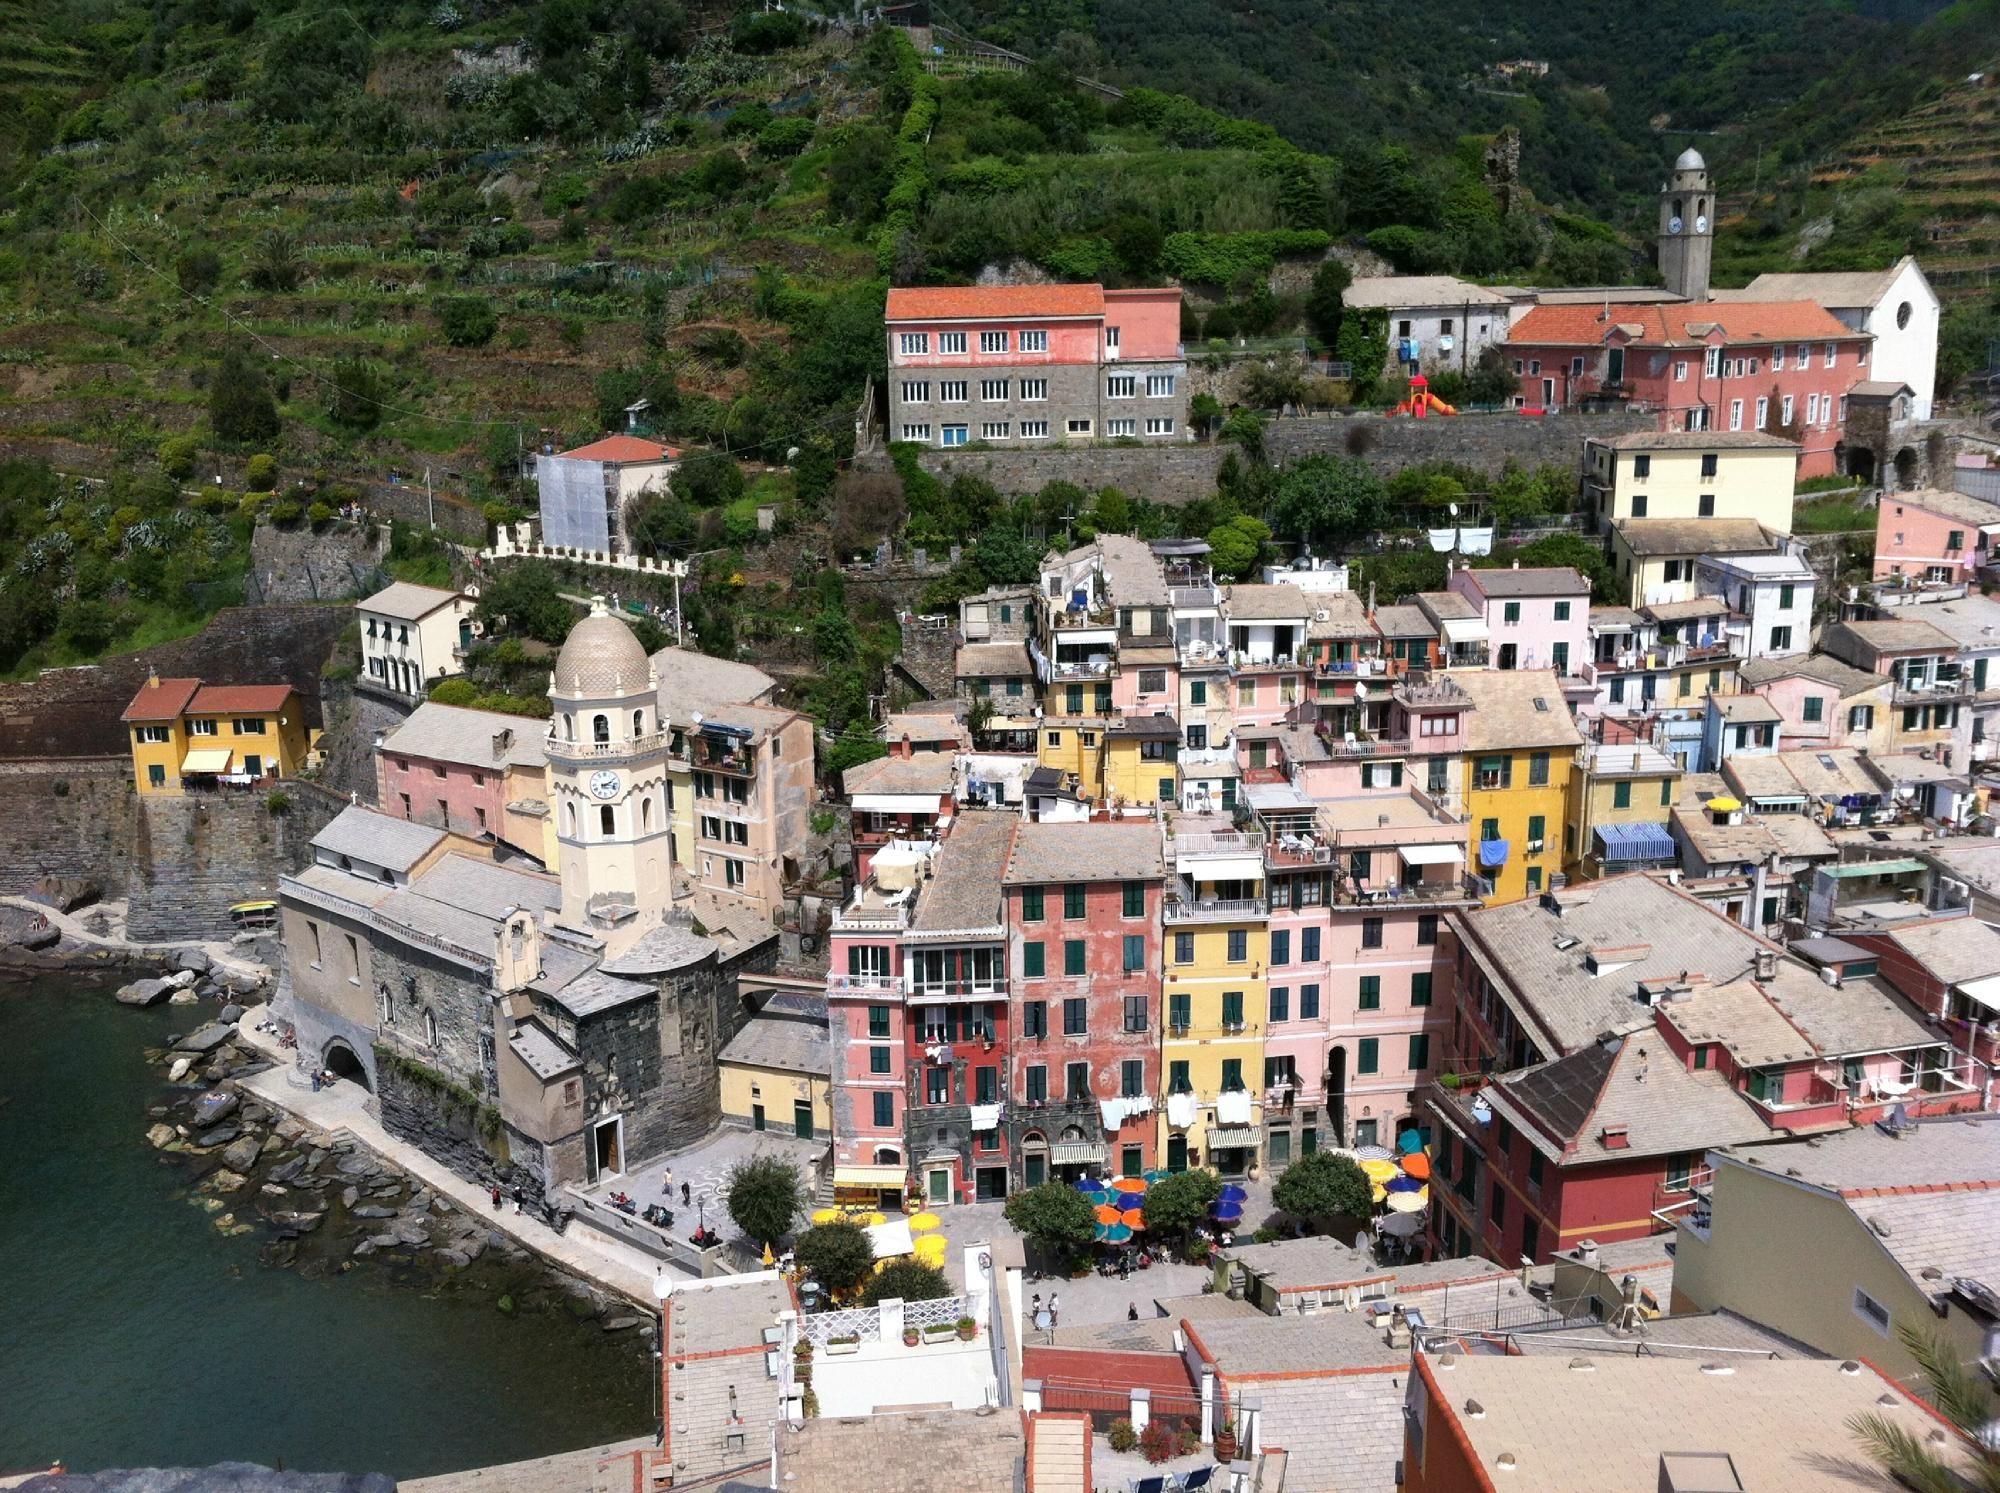 Castello Doria (La Spezia, Italy): Top Tips Before You Go - TripAdvisor